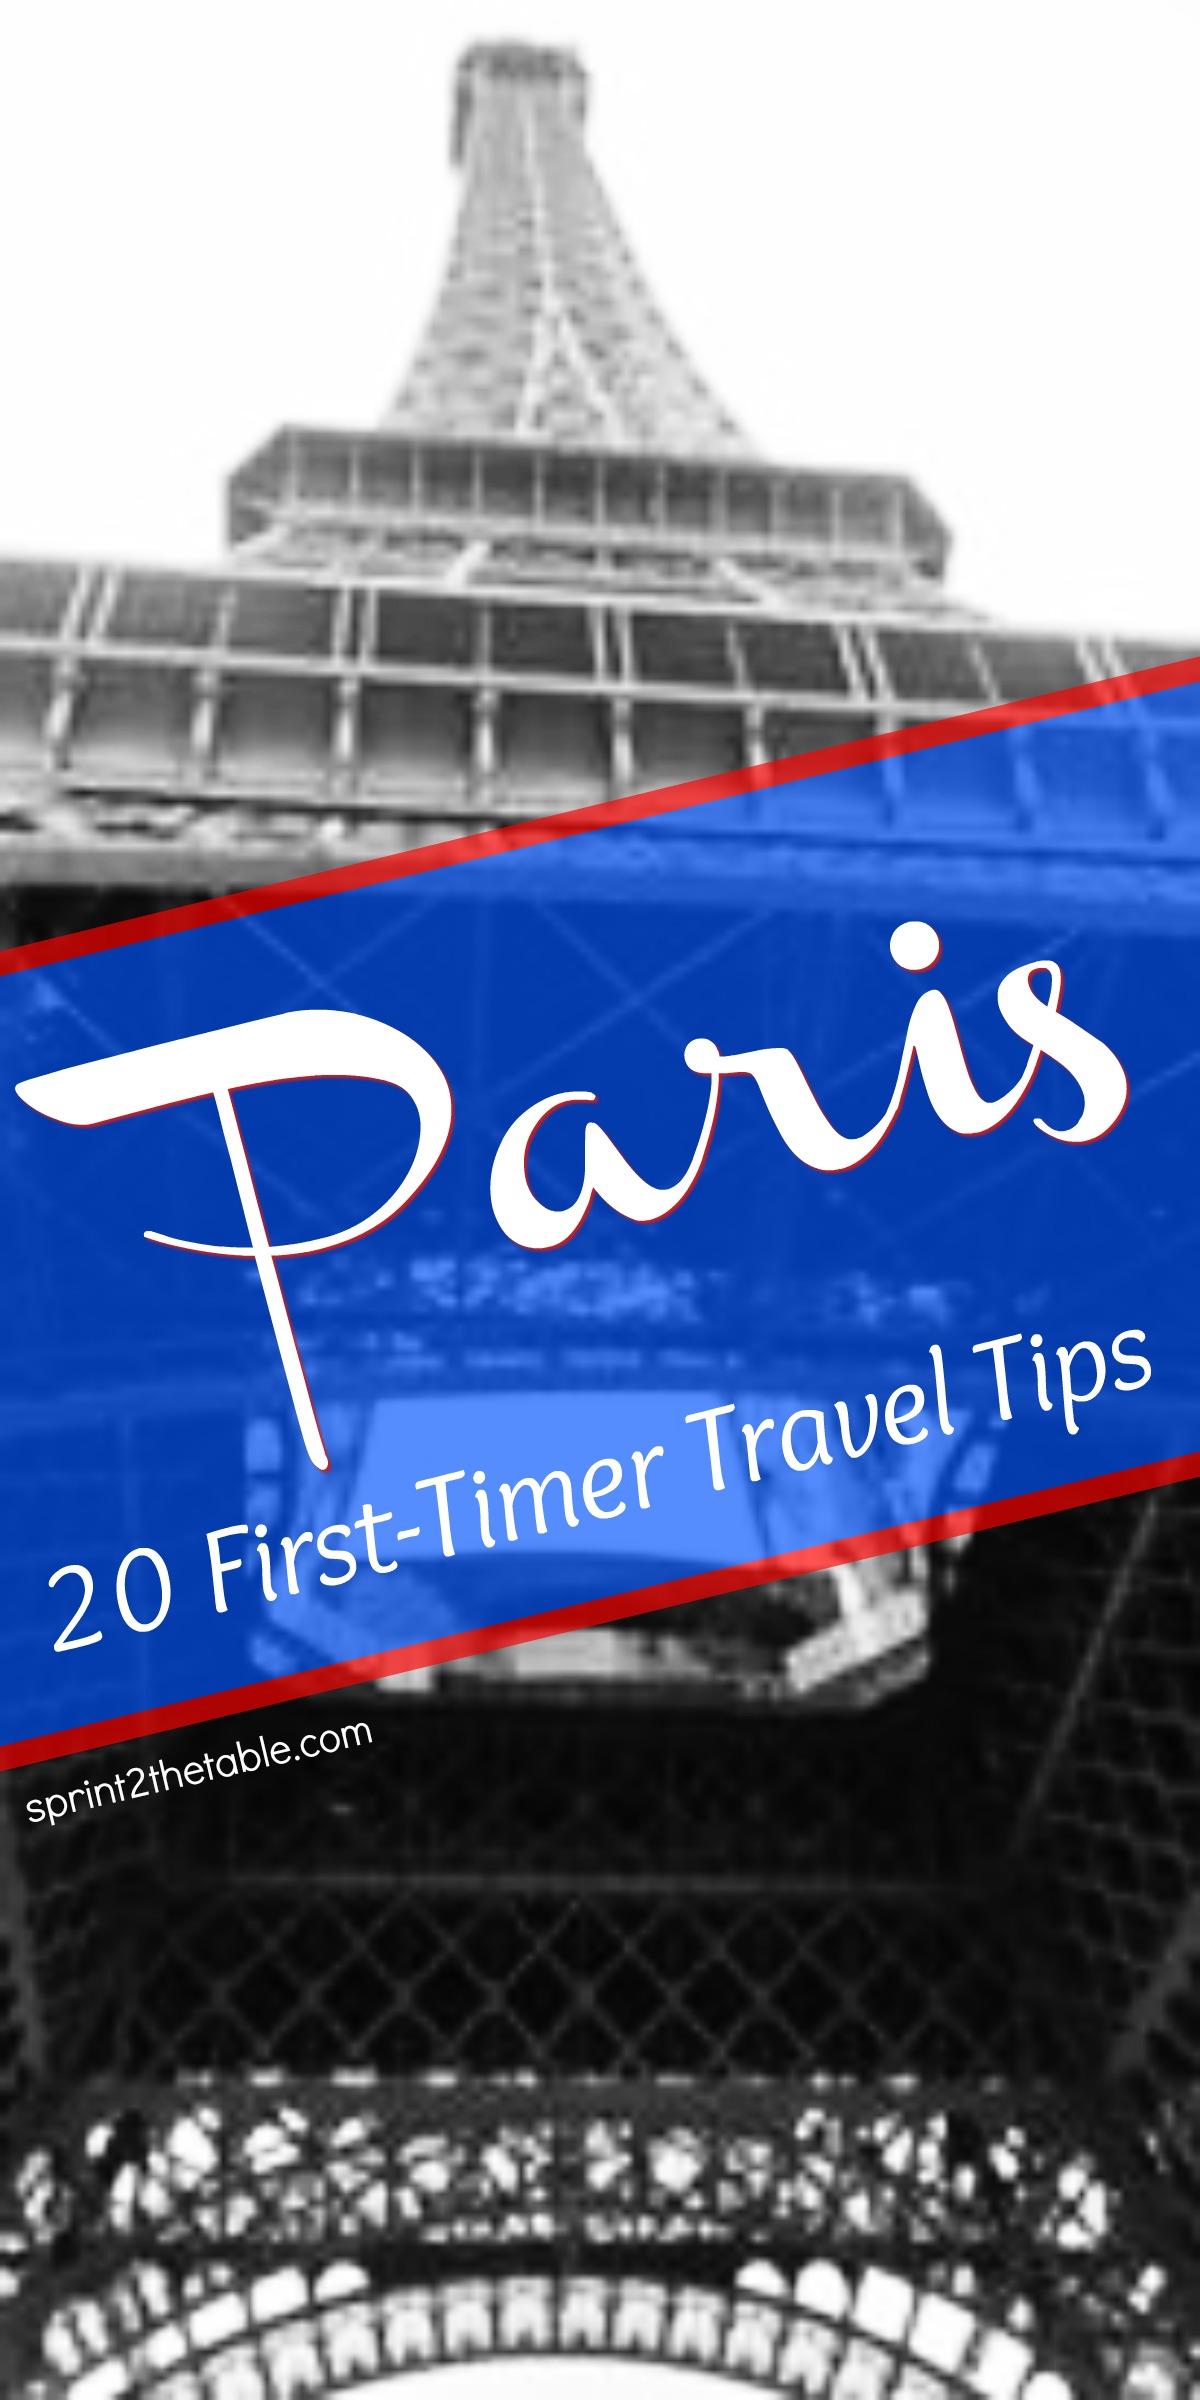 Paris: 20 First-Timer Travel Tips